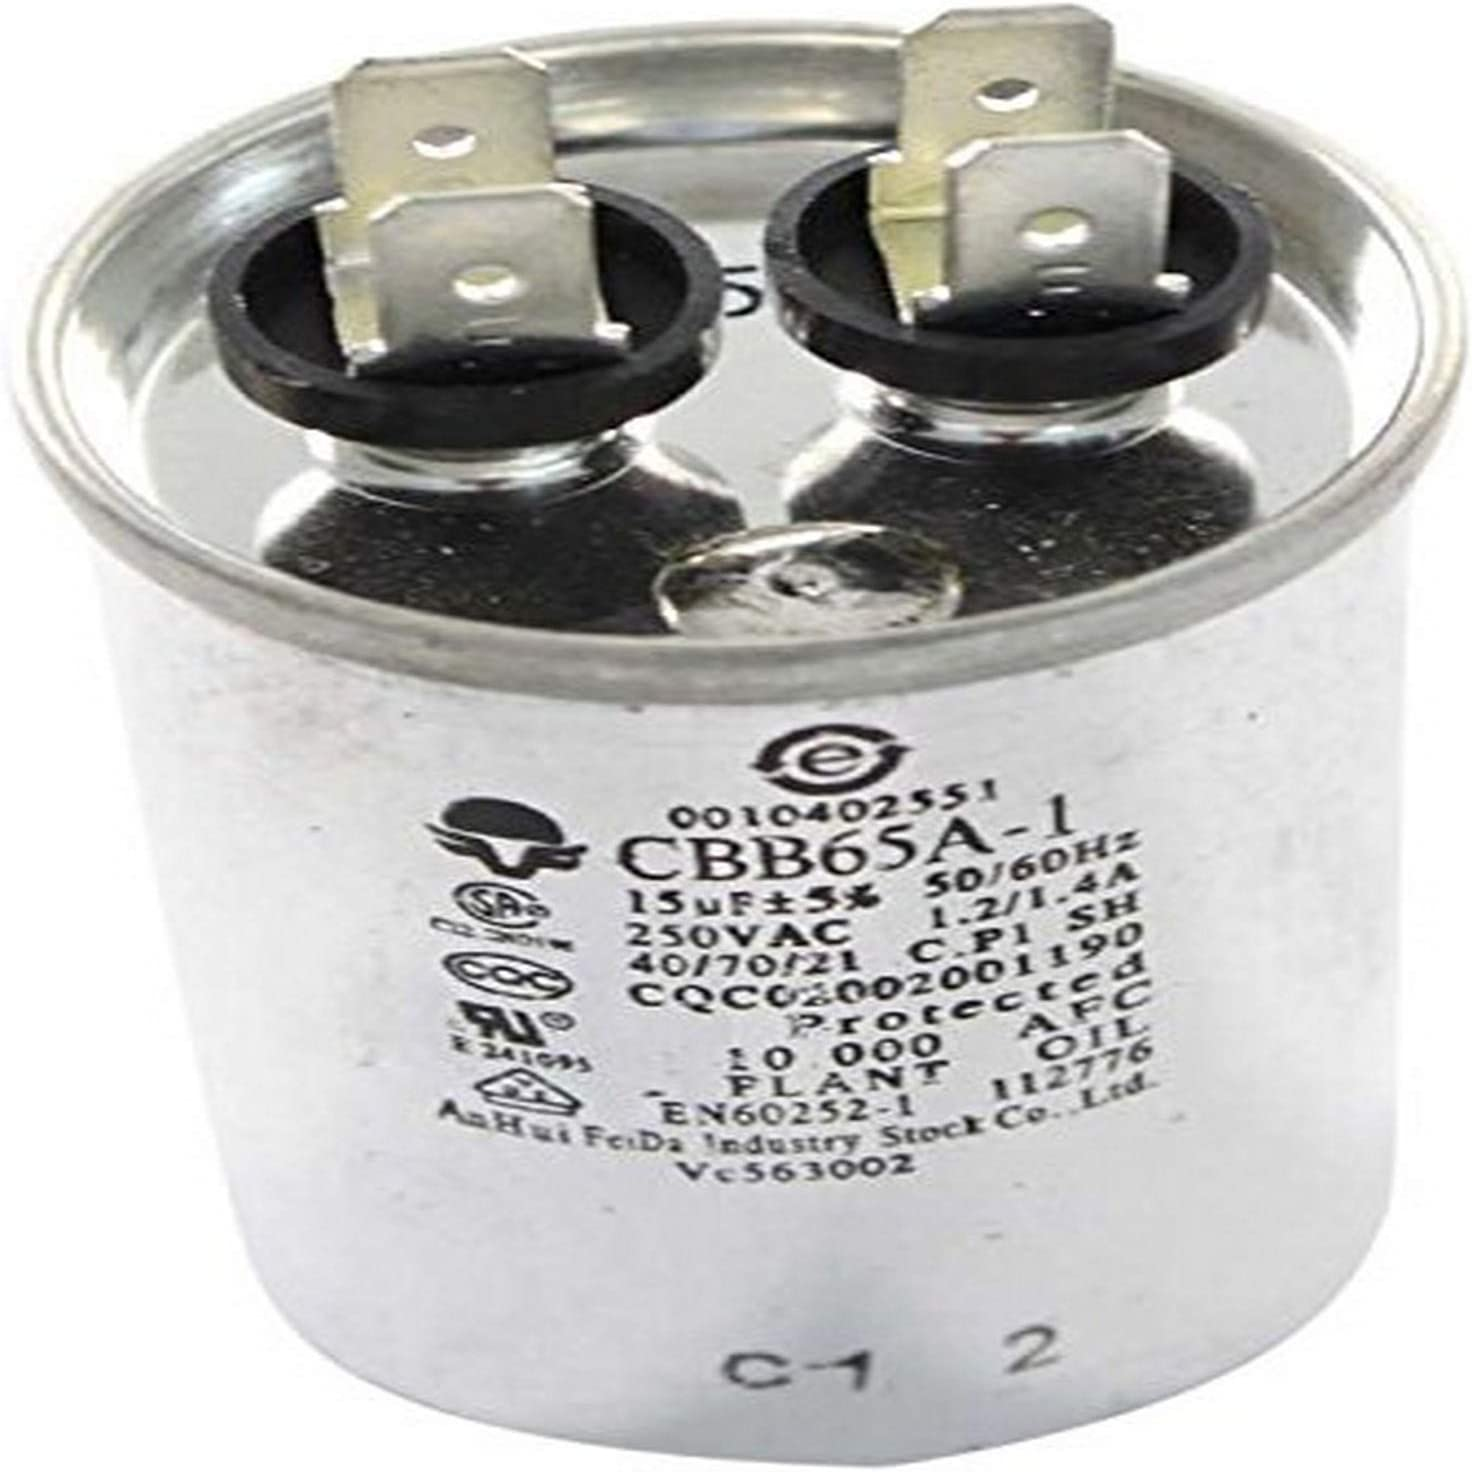 Haier AC-1400-37 Capacitor Compress